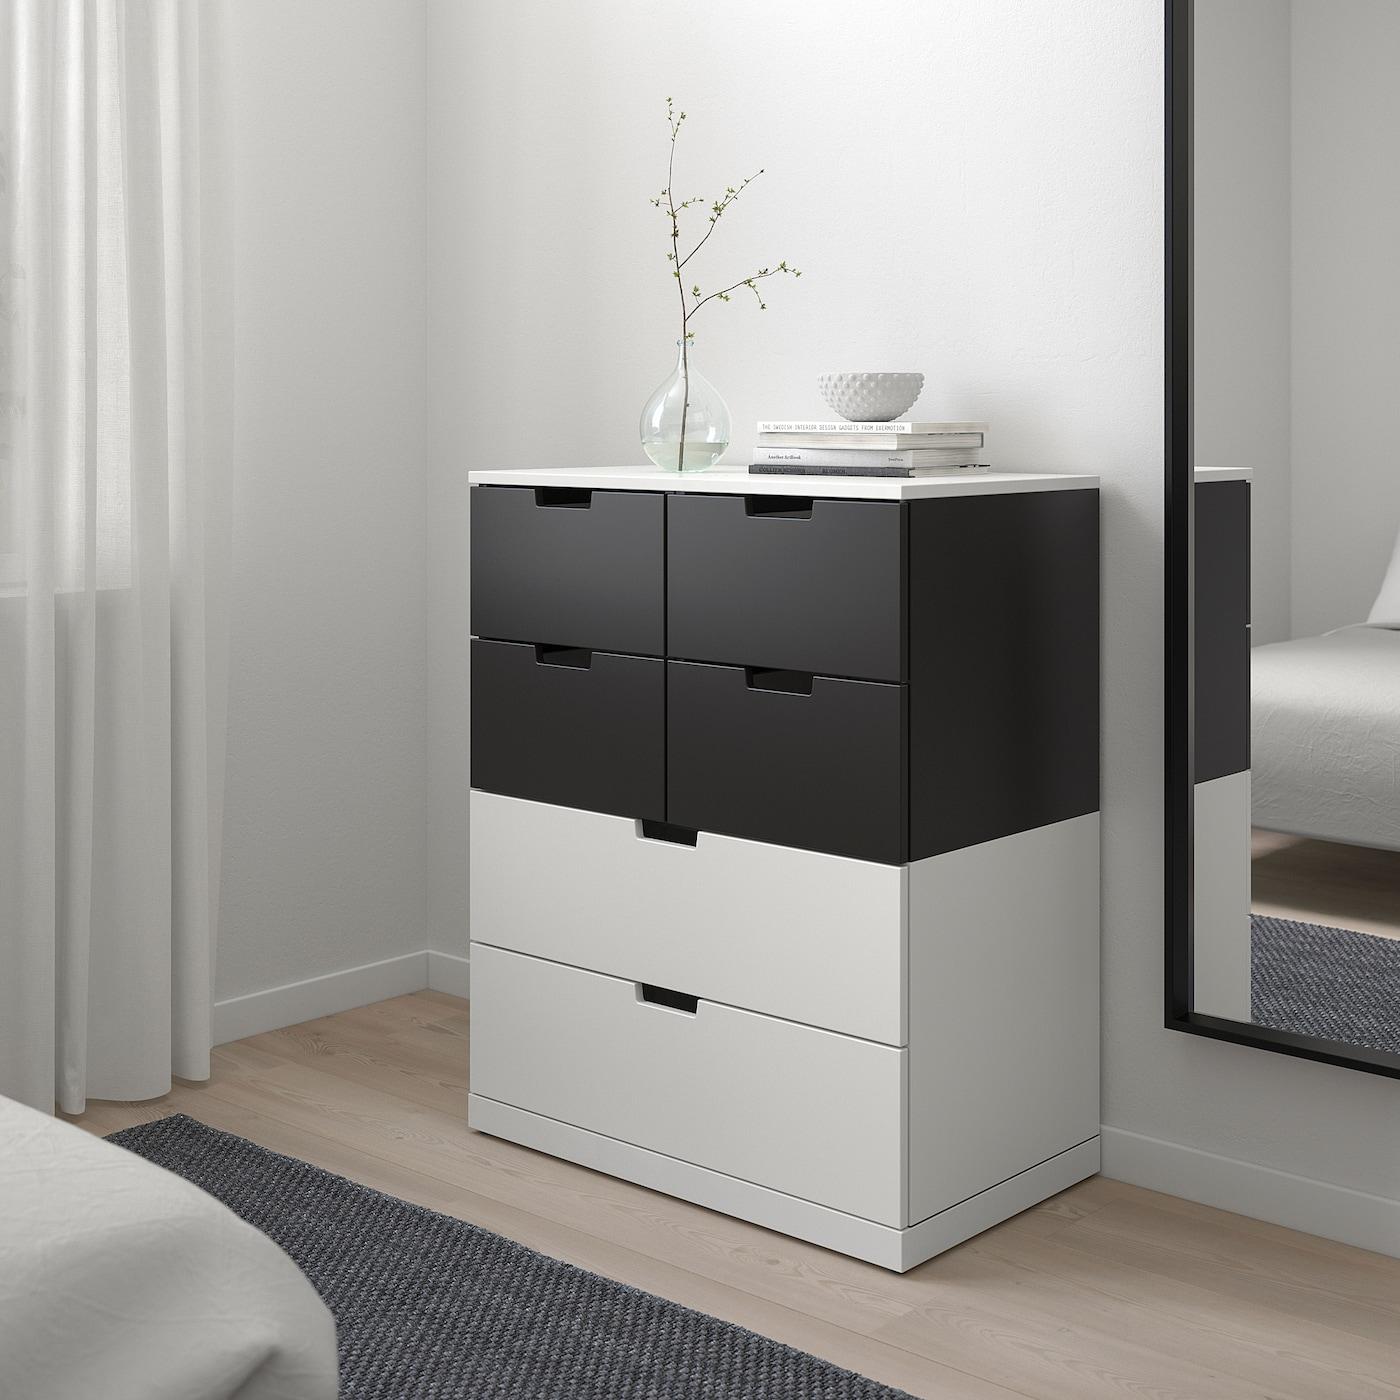 NORDLI Chest of 6 drawers, white/anthracite, 80x99 cm